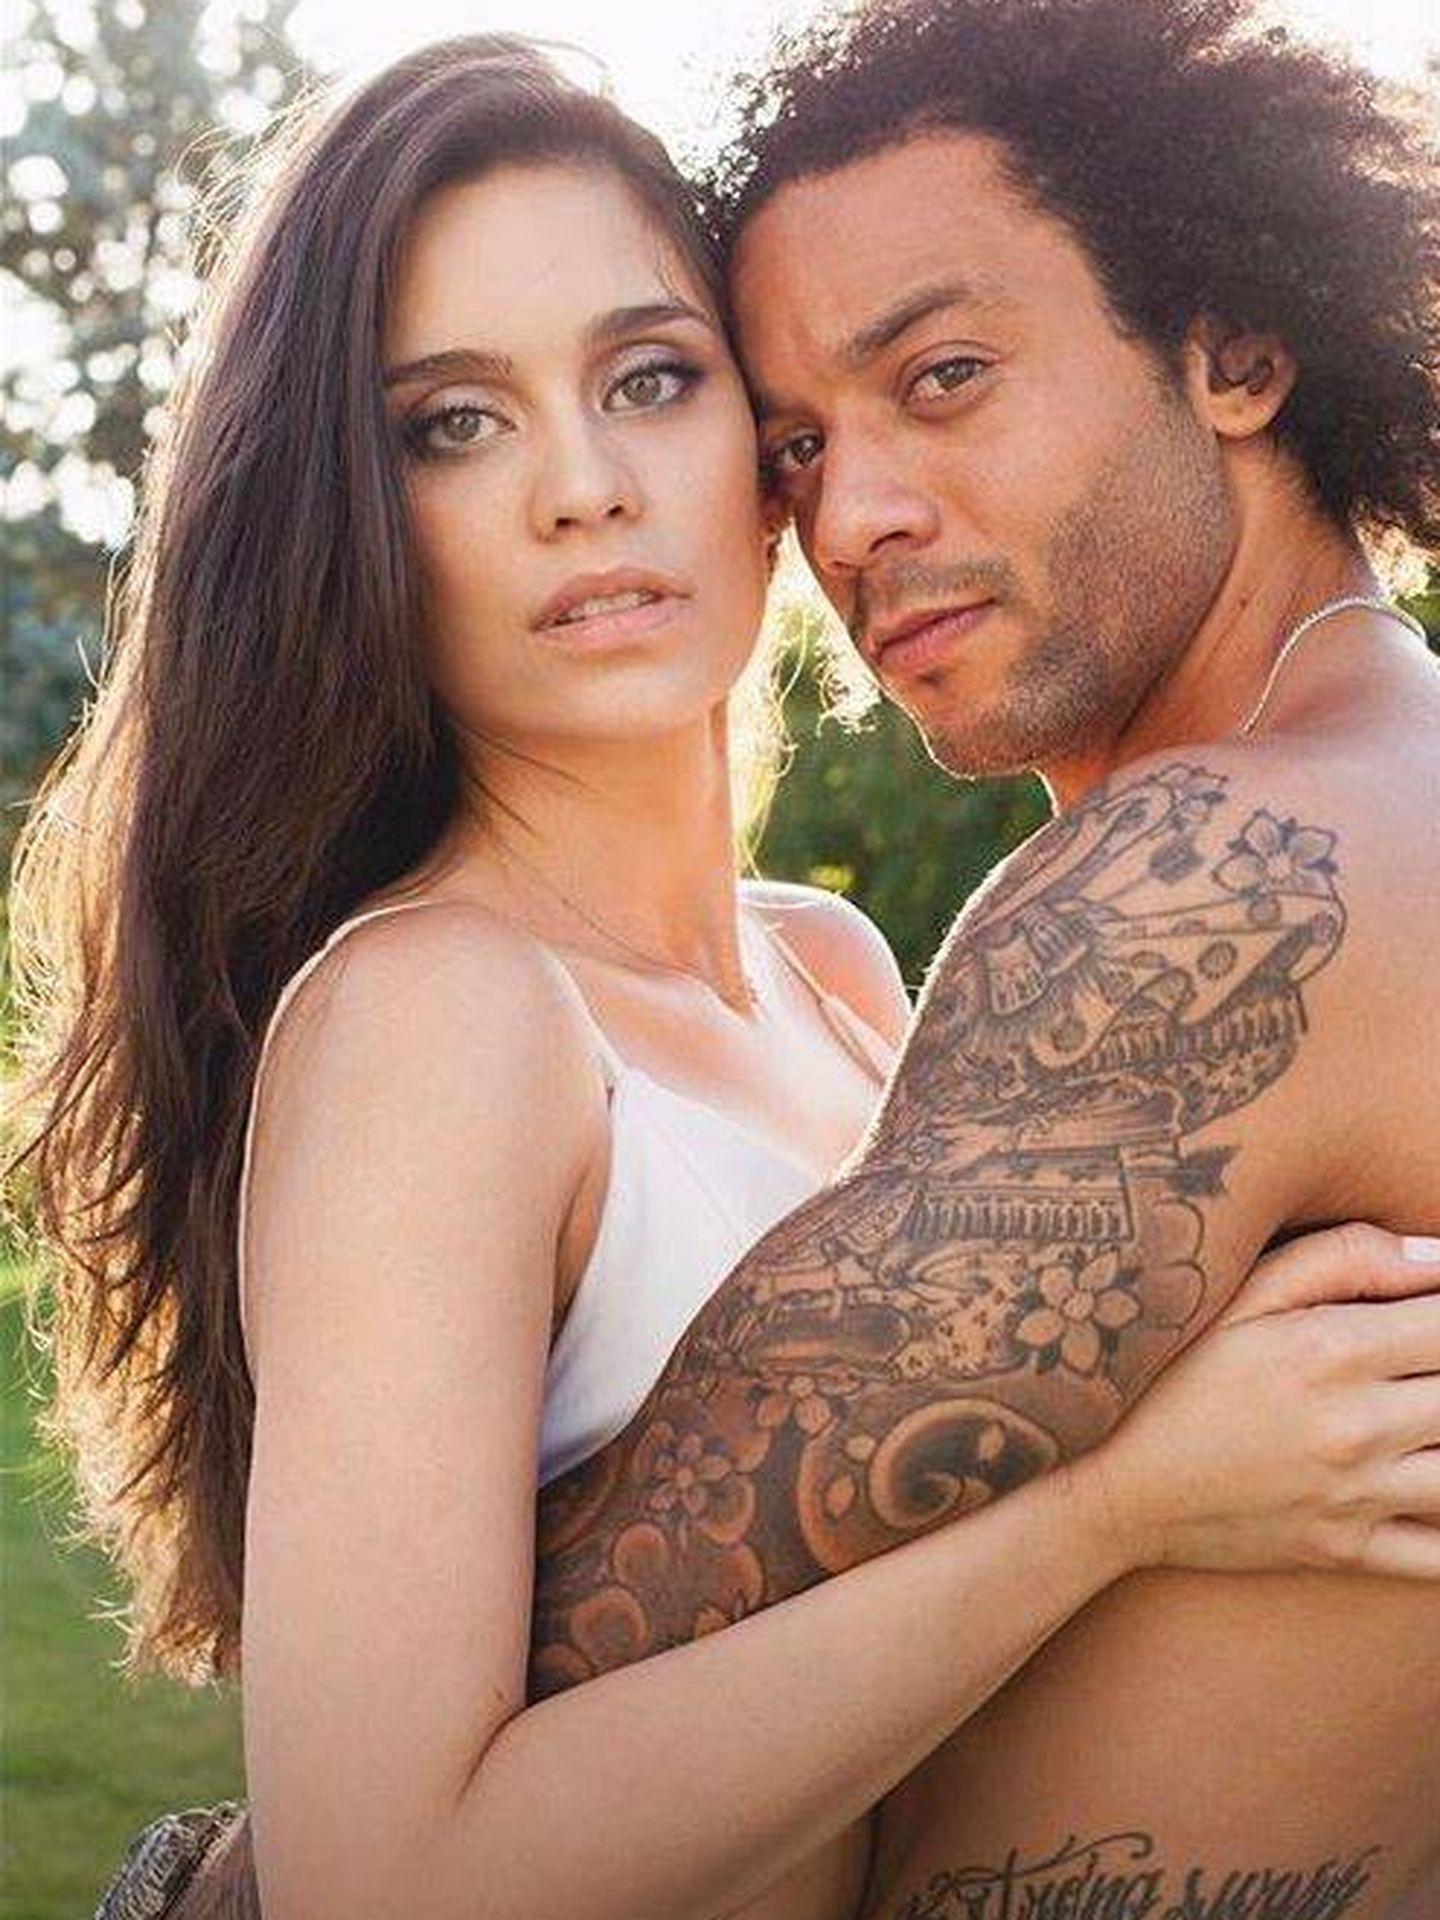 Clarice Alves y Marcelo. (Instagram)